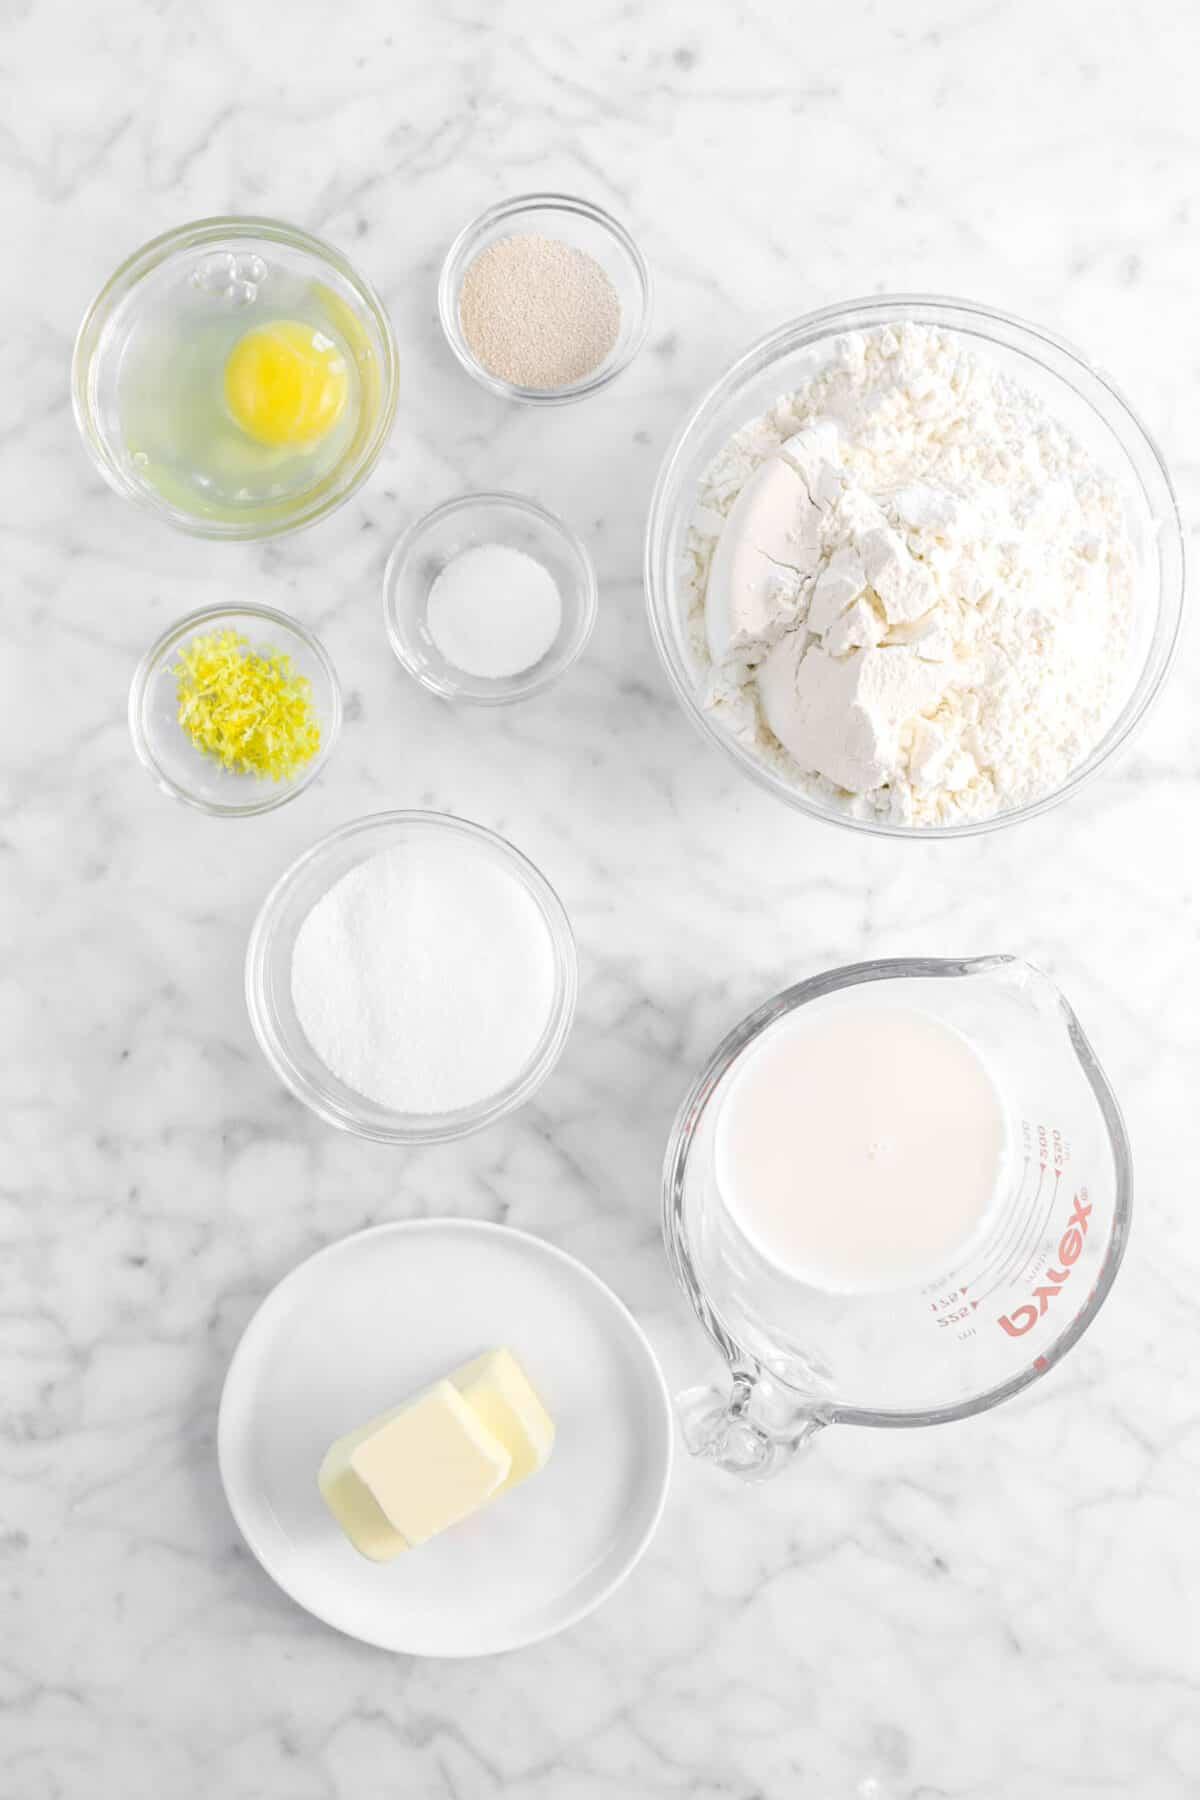 egg, yeast, flour, baking powder, lemon zest, sugar, milk, and butter on marble counter